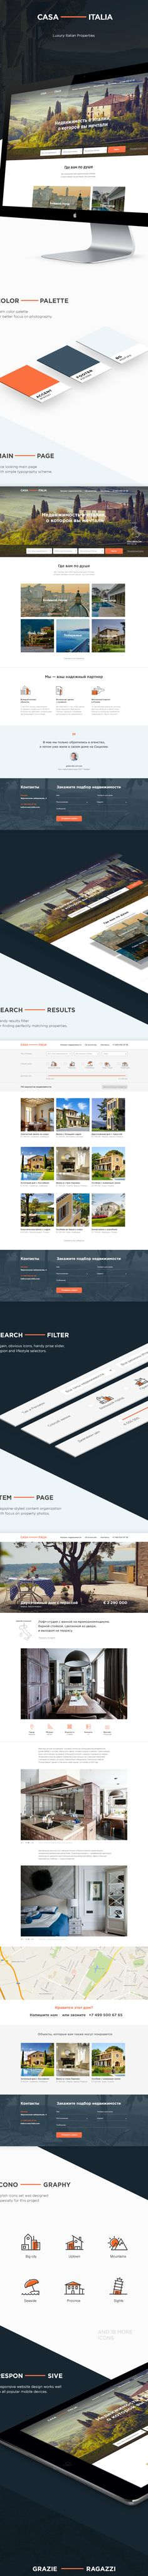 Casa Italia — Luxury Italian Properties on Web Design Served